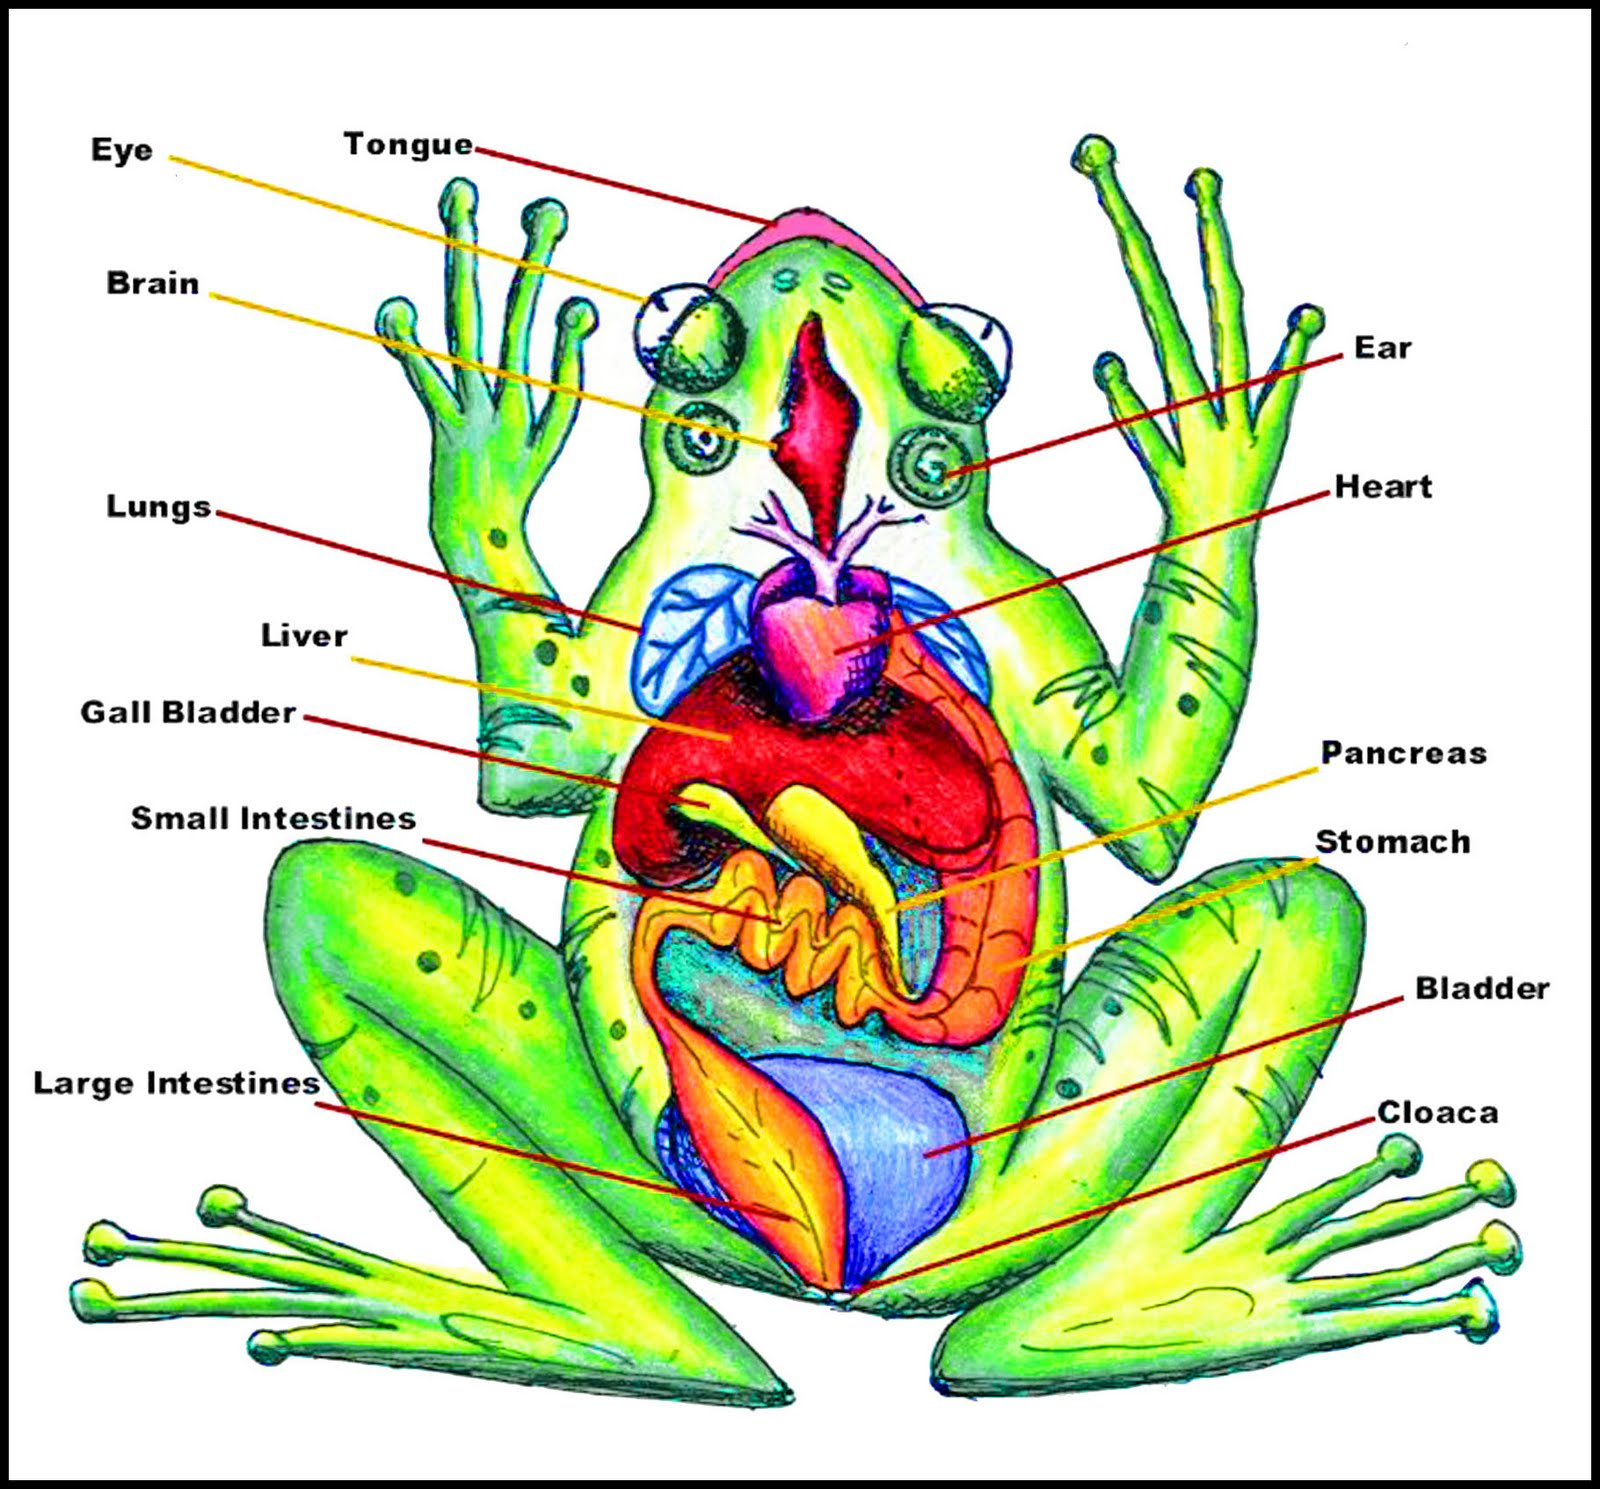 Eyes Tree Frog Diagram - DIY Enthusiasts Wiring Diagrams •